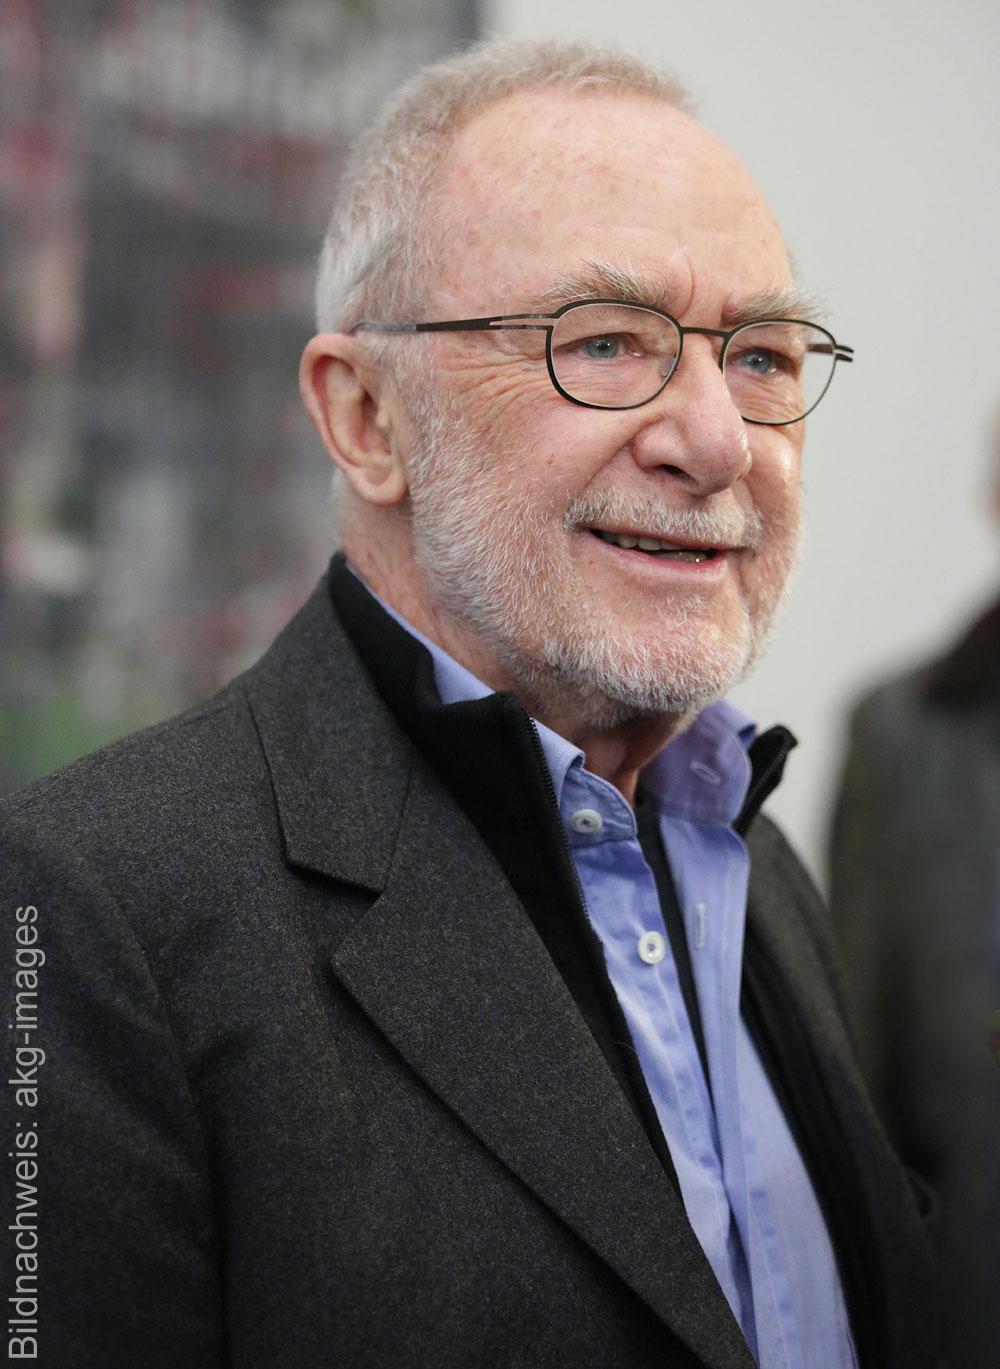 Porträt des Künstlers Gerhard Richter